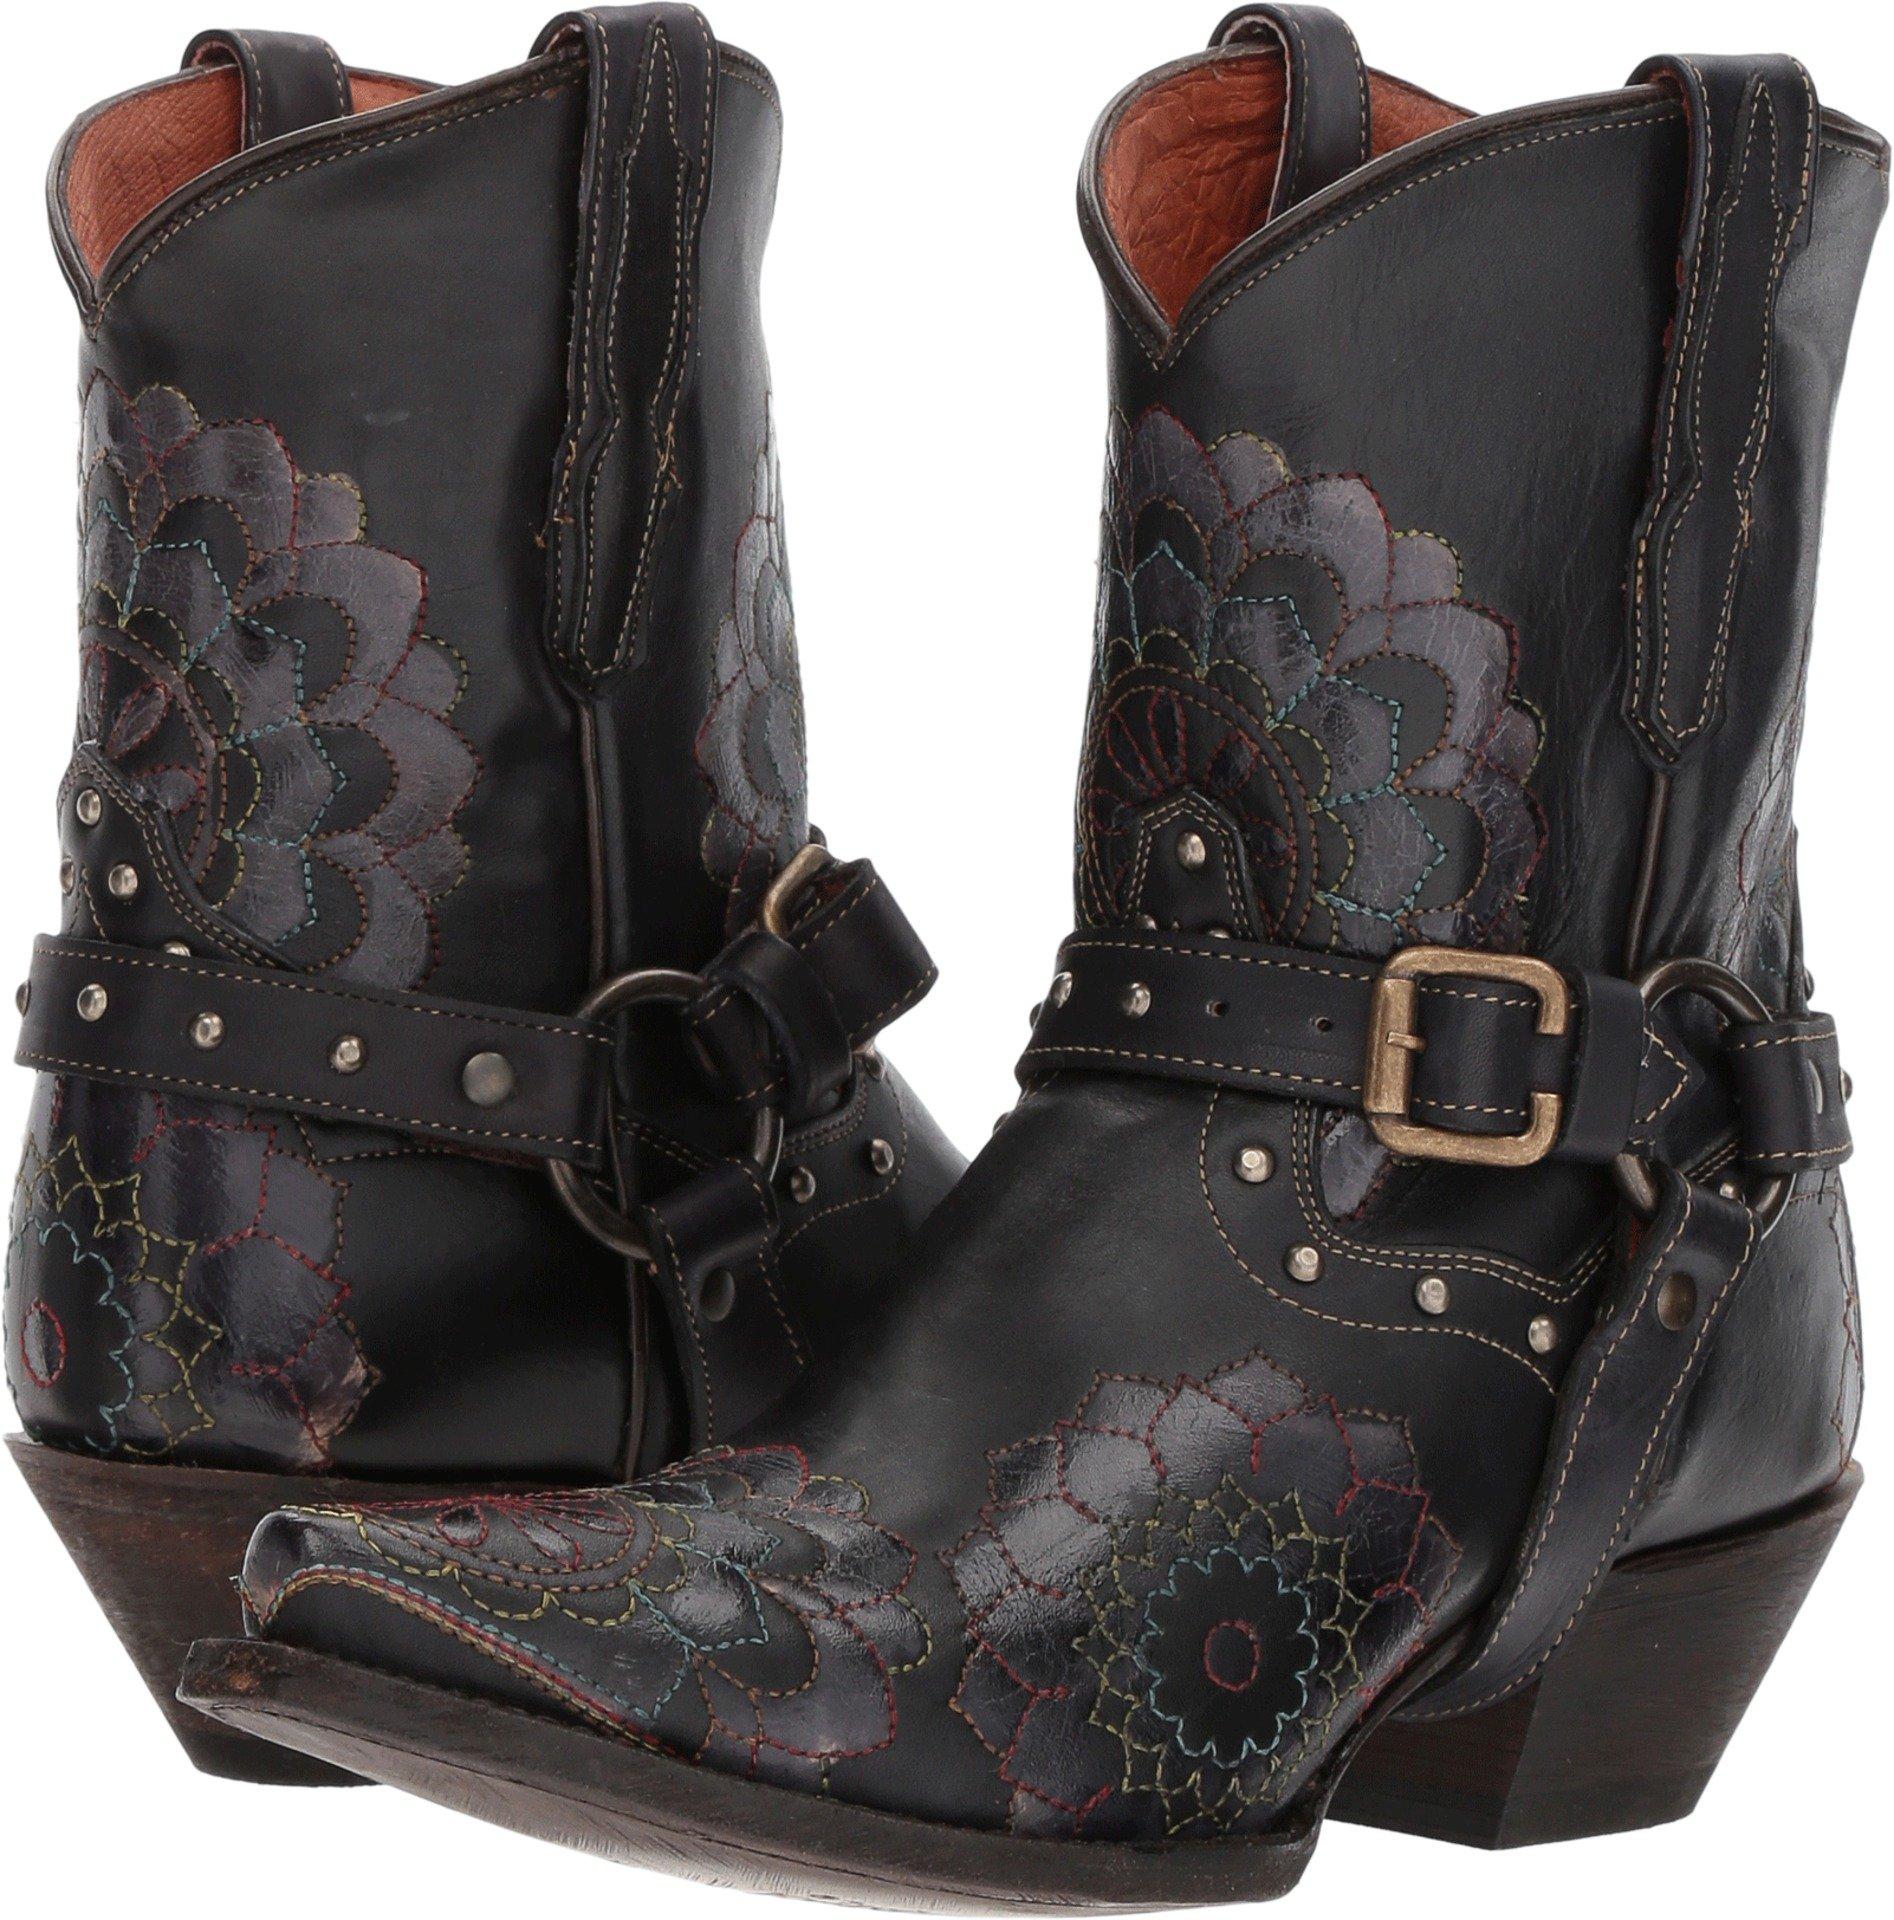 Dan Post Western Boots Womens Leslie 7.5 M Black Floral DP3545